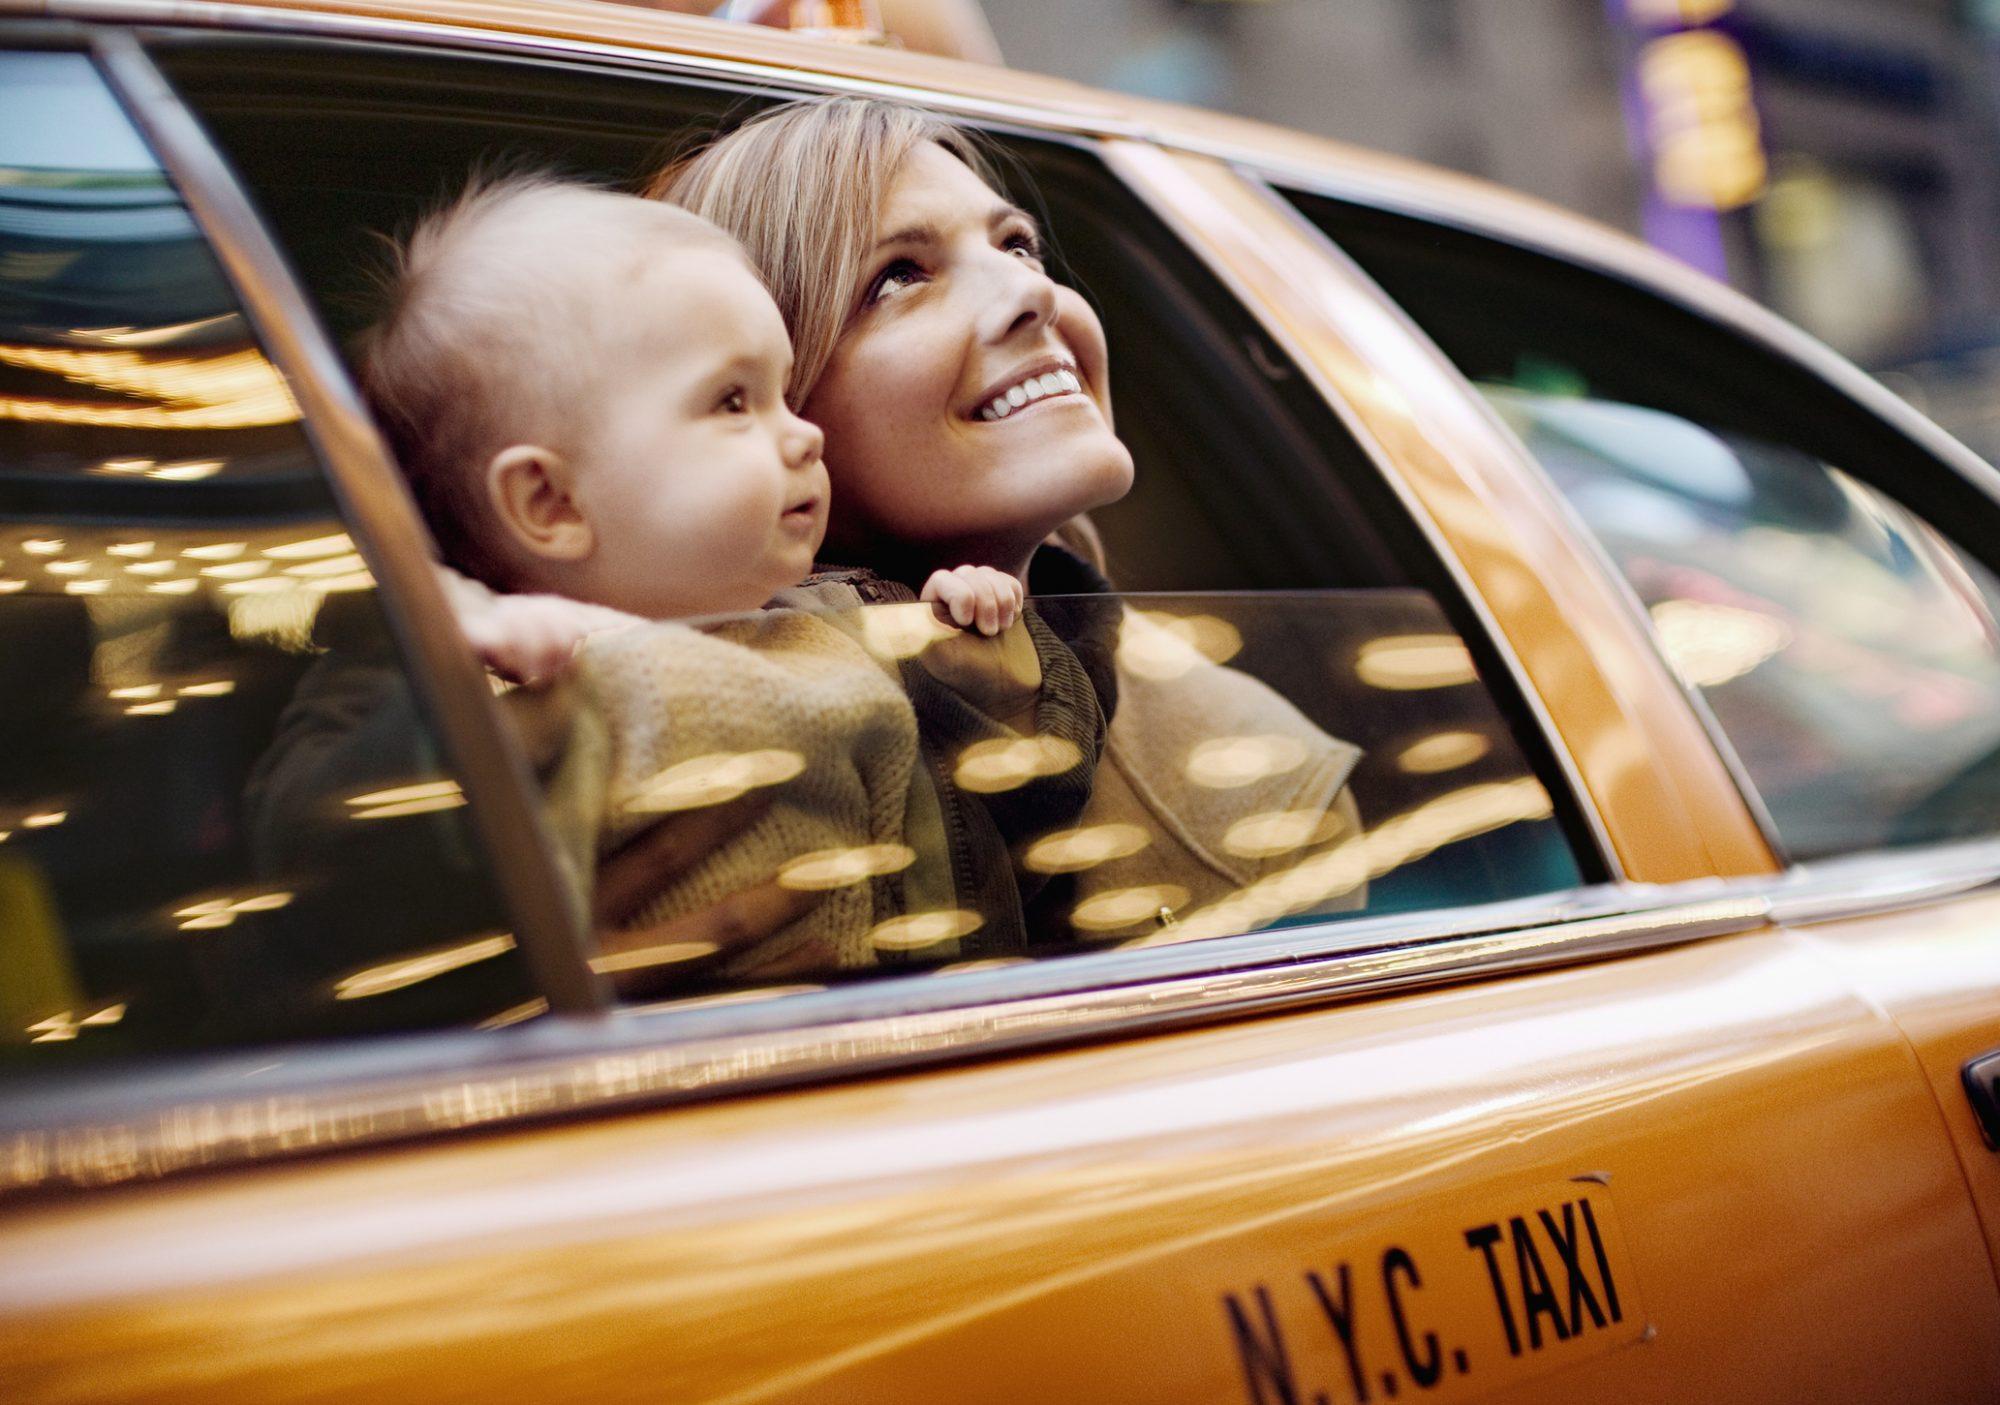 baby-taxi.jpg